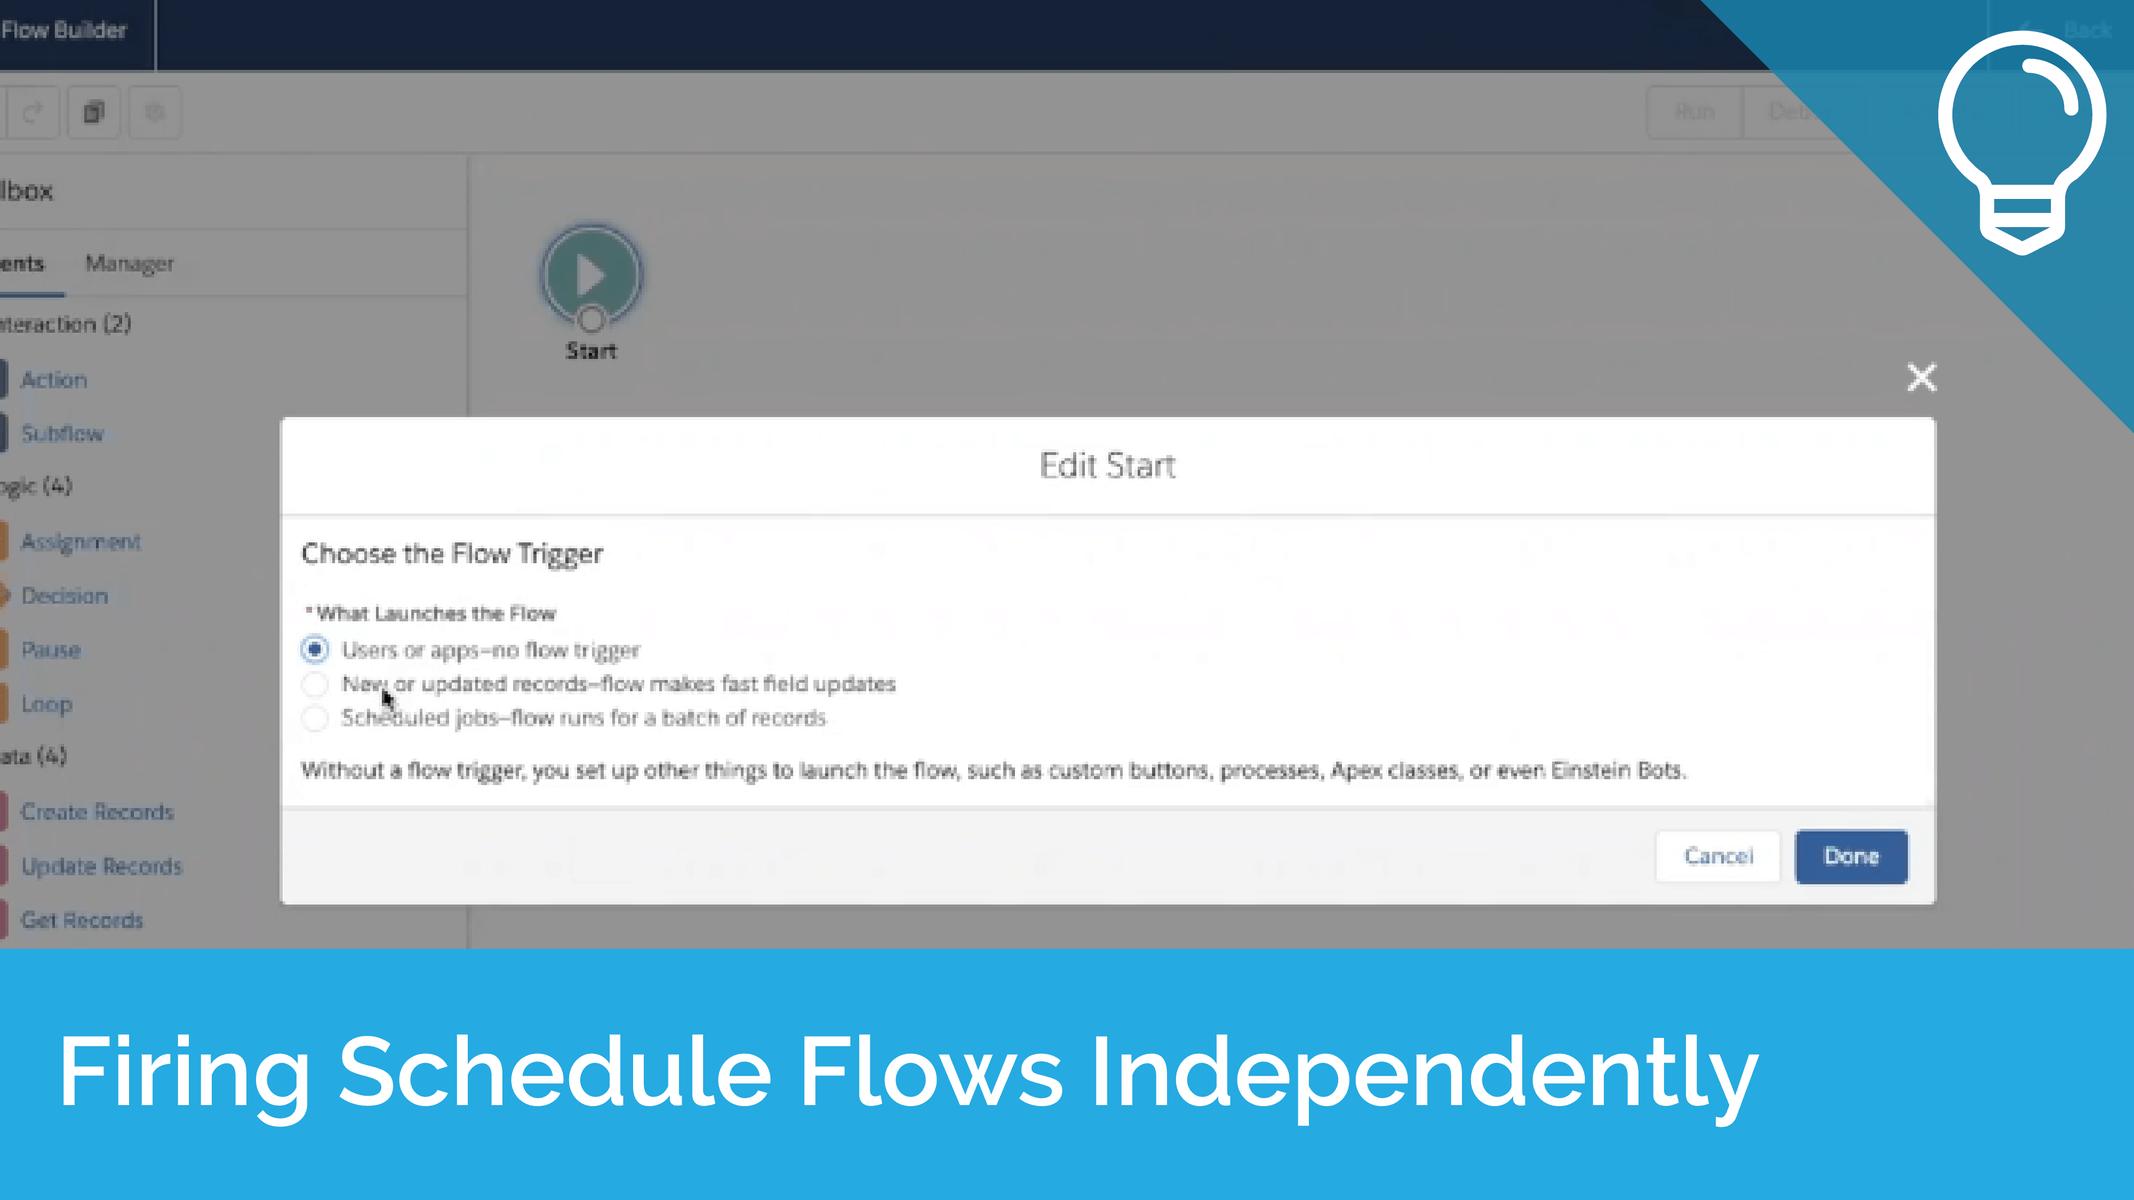 Firing Schedule Flows Independently Tip